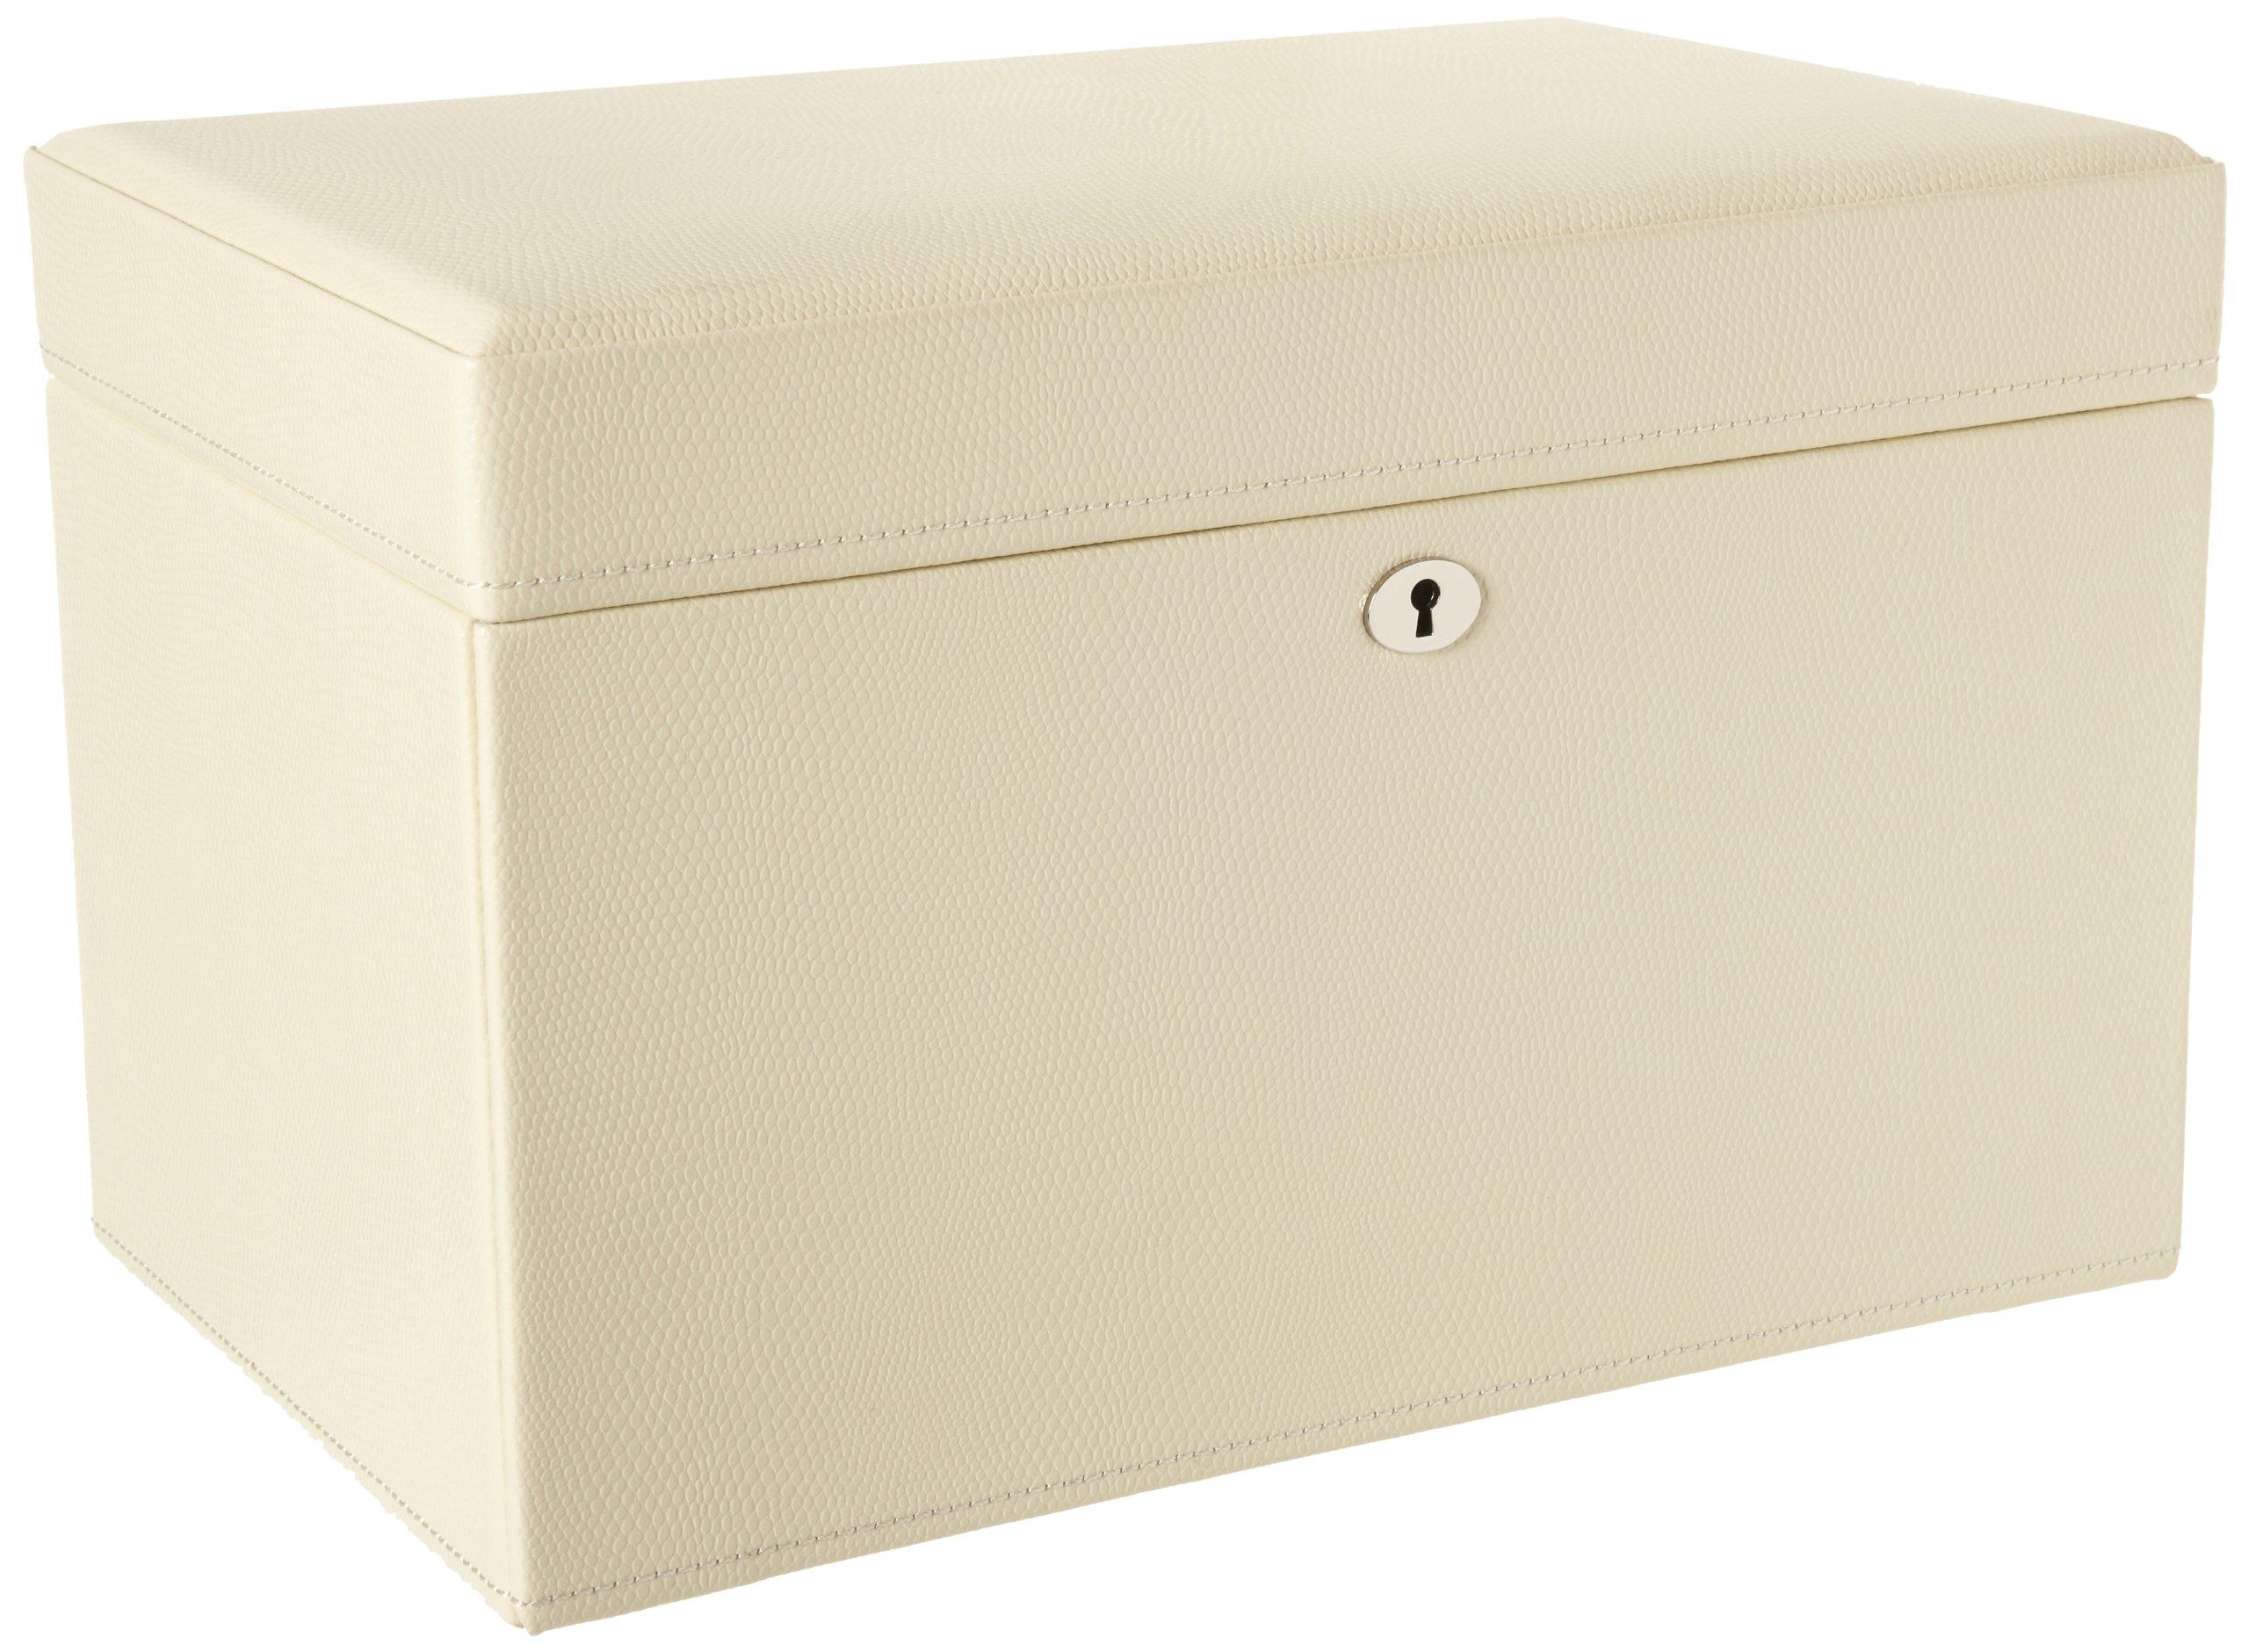 WOLF 315153 London Medium Jewelry Box, Cream